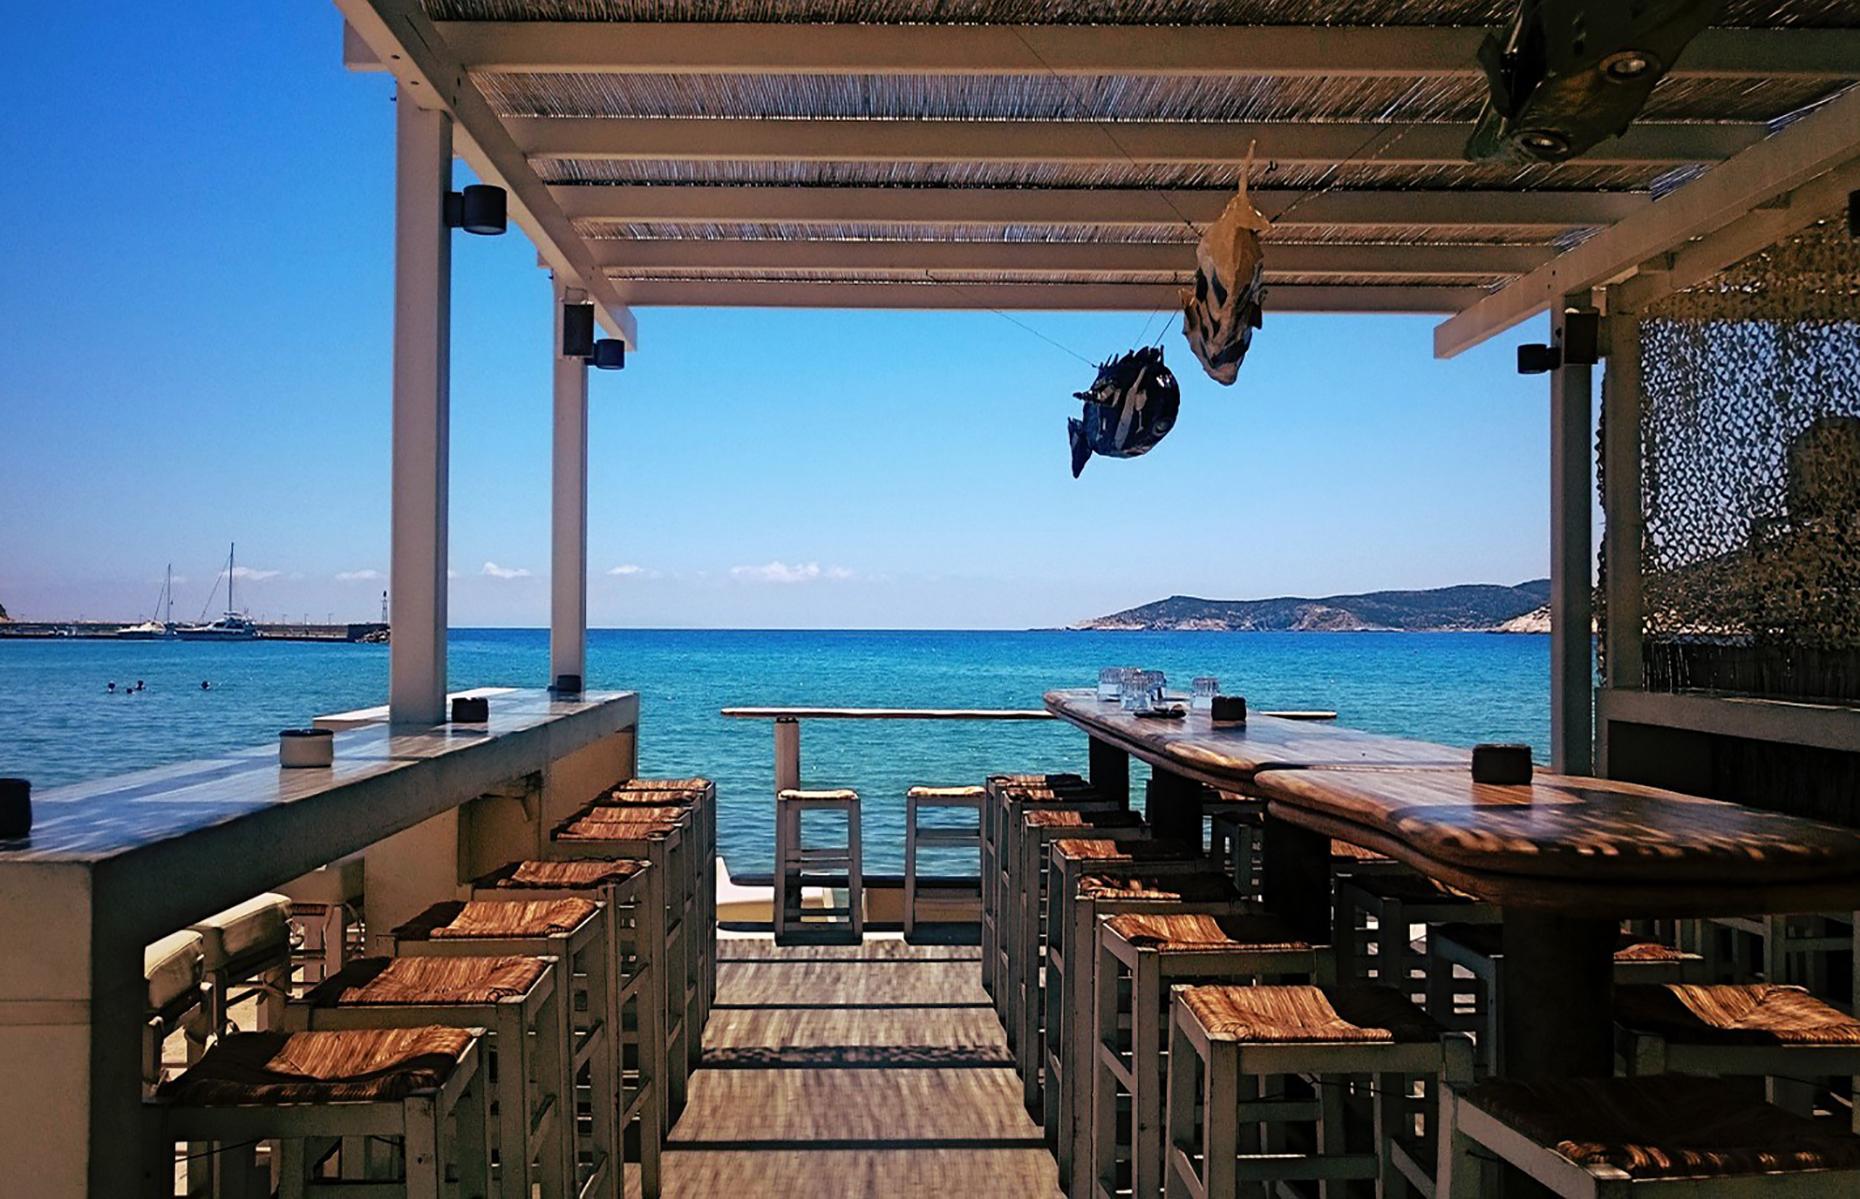 Omega3 Restaurant in Platis Gialos, Sifnos (Image: Omega3/Facebook)